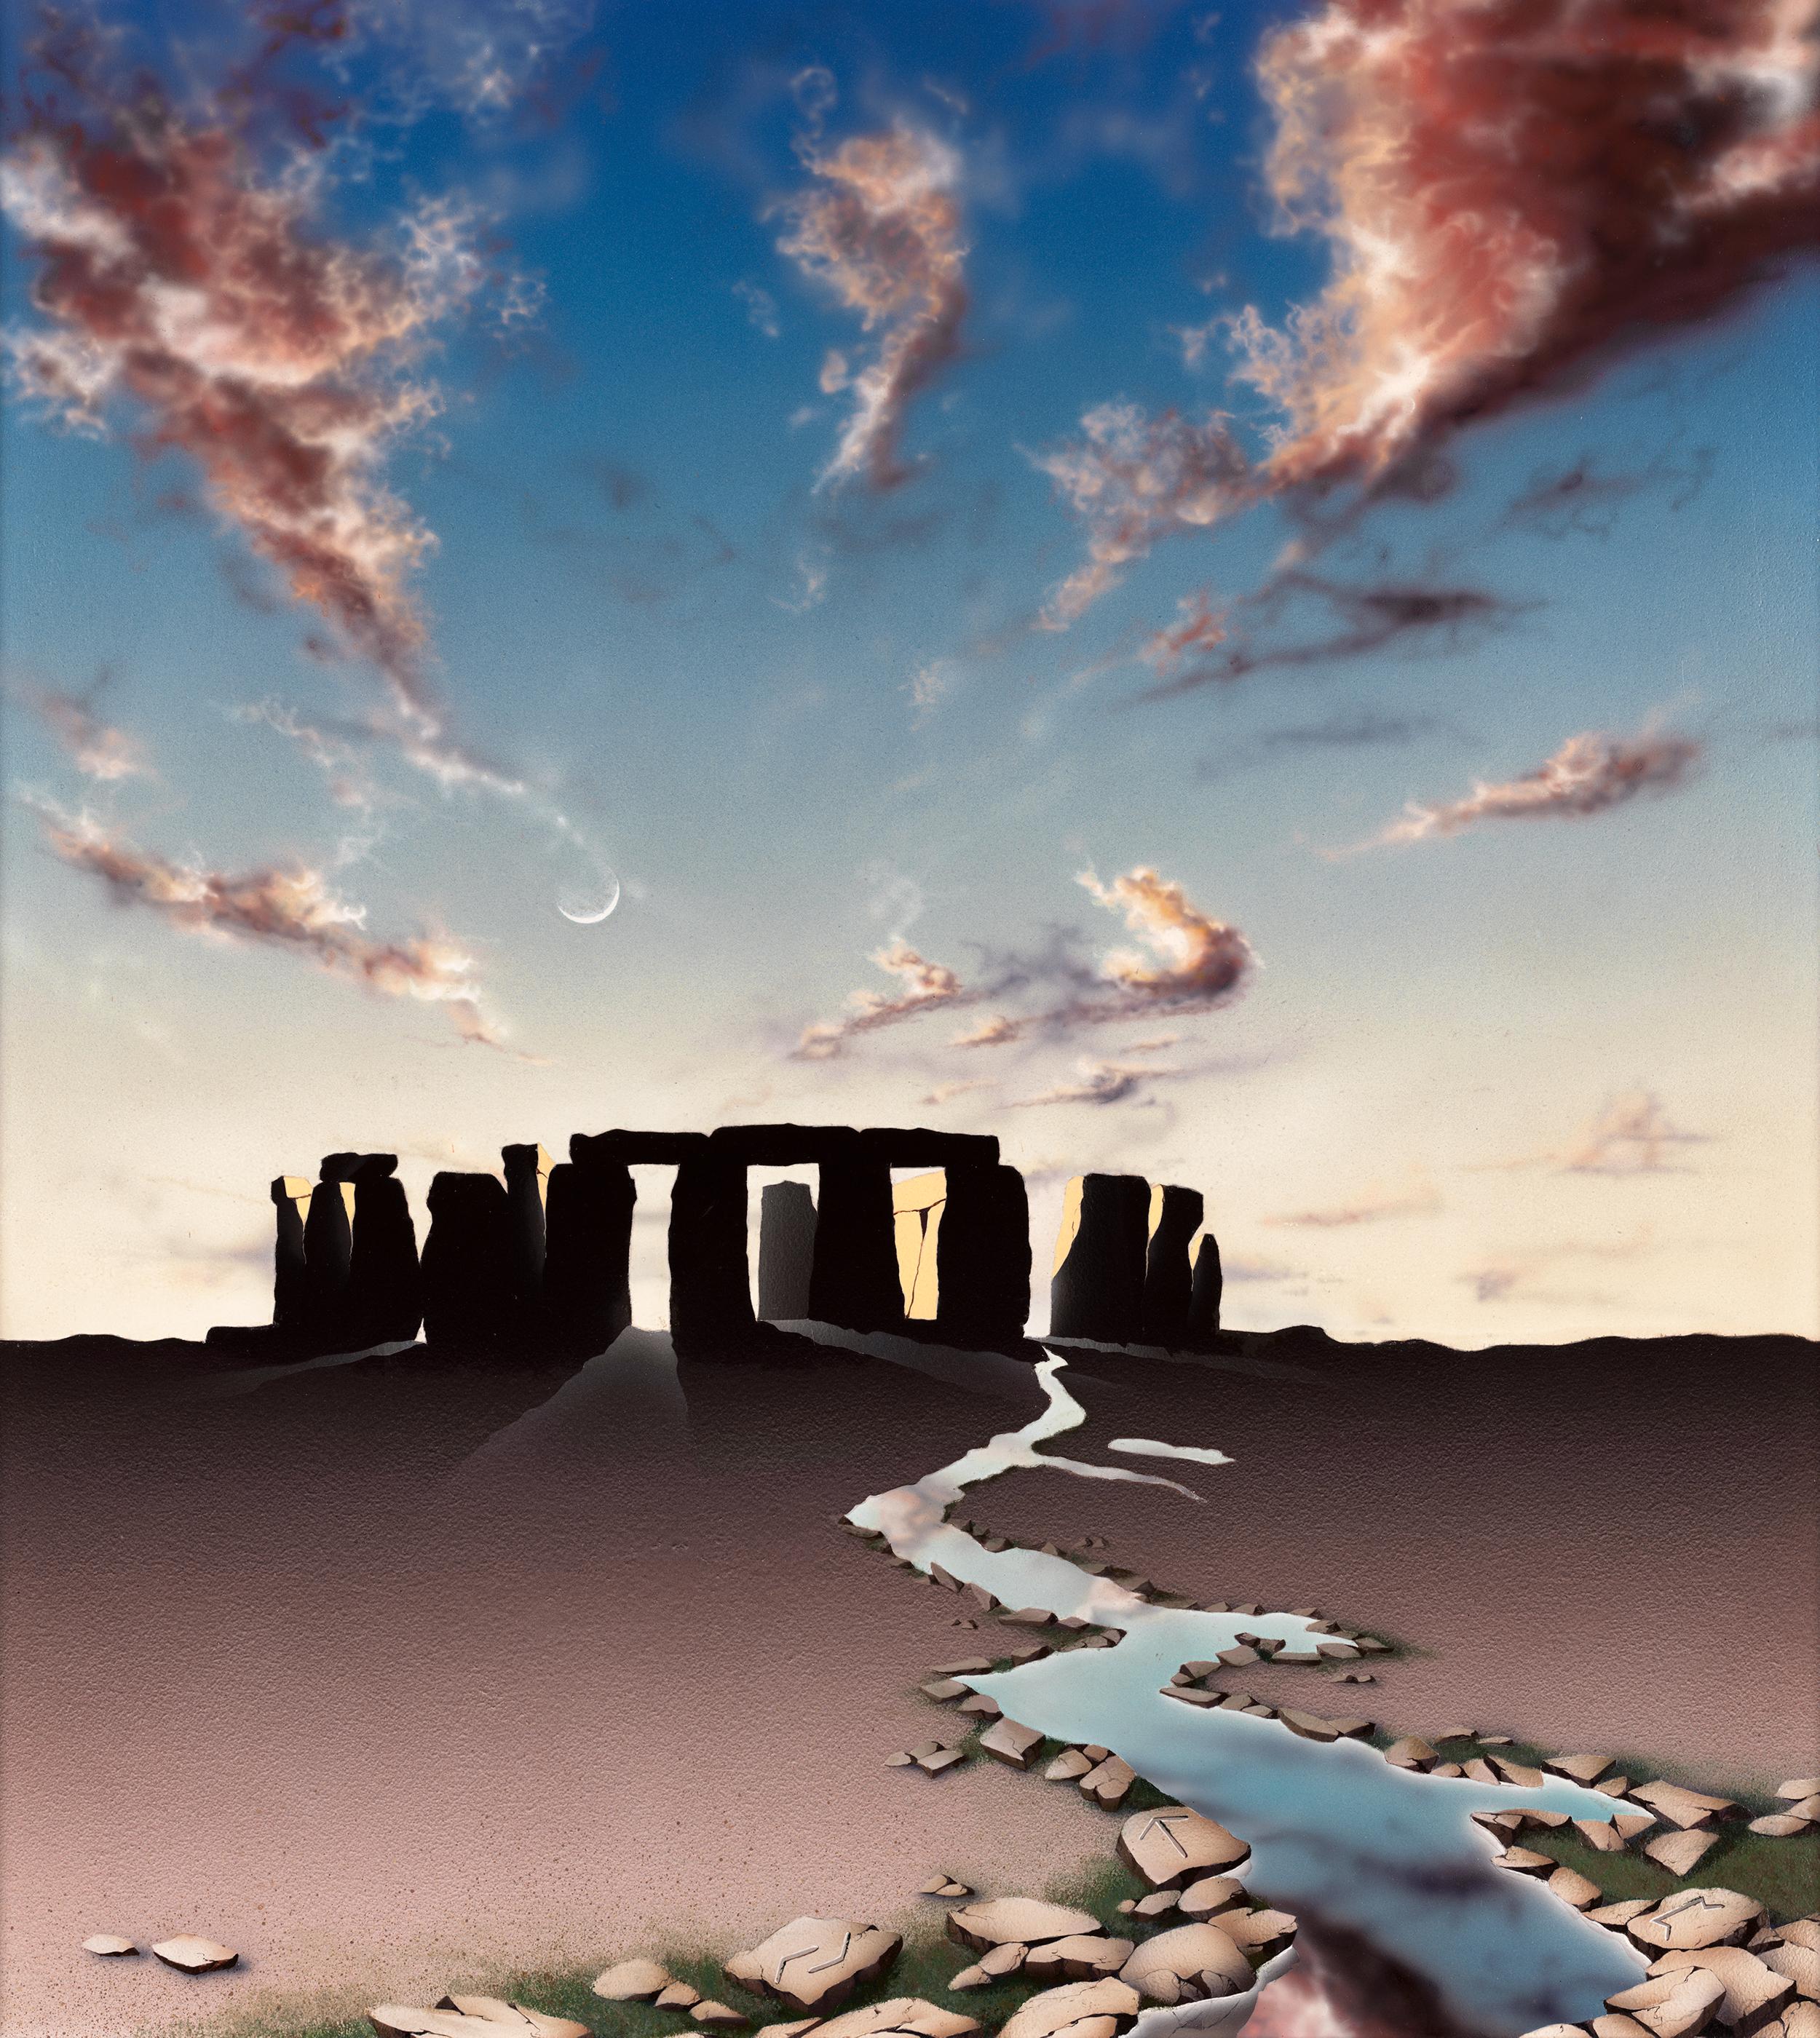 Stonehenge, 1997: Acrylic and varnish on board, 38 x 34 in (97 x 86 cm)